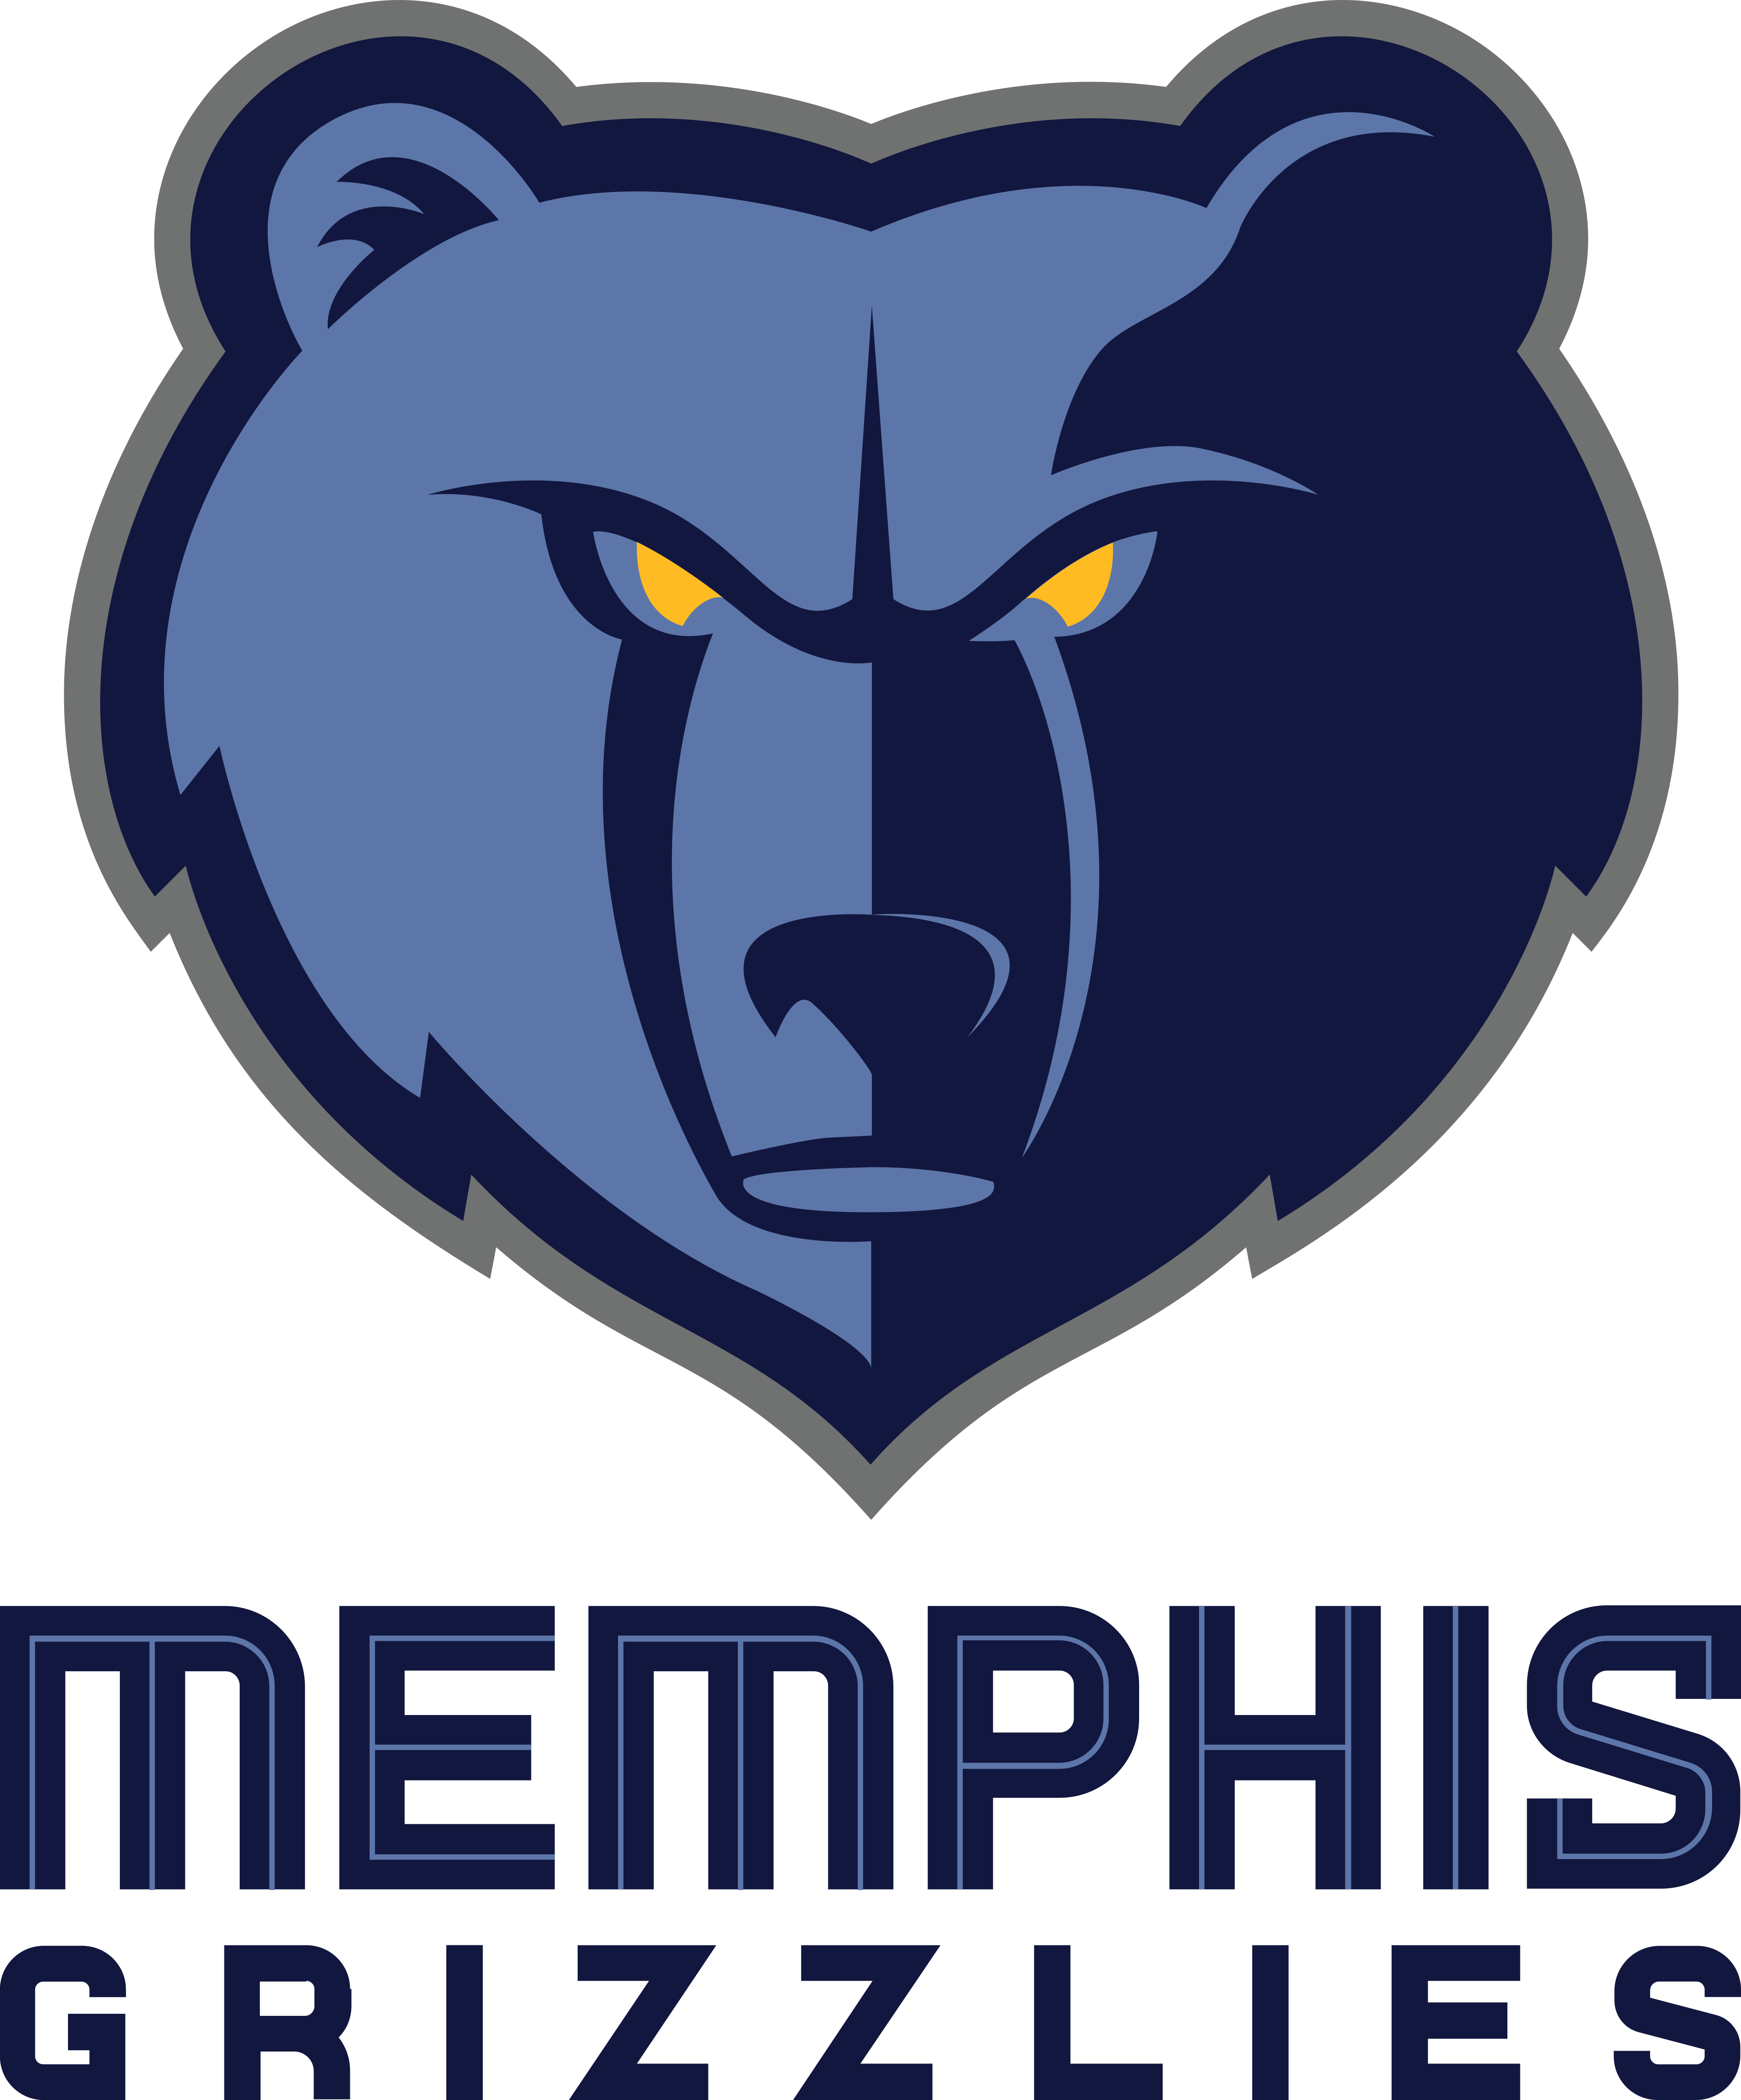 memphis grizzlies logo 1 - Memphis Grizzlies Logo